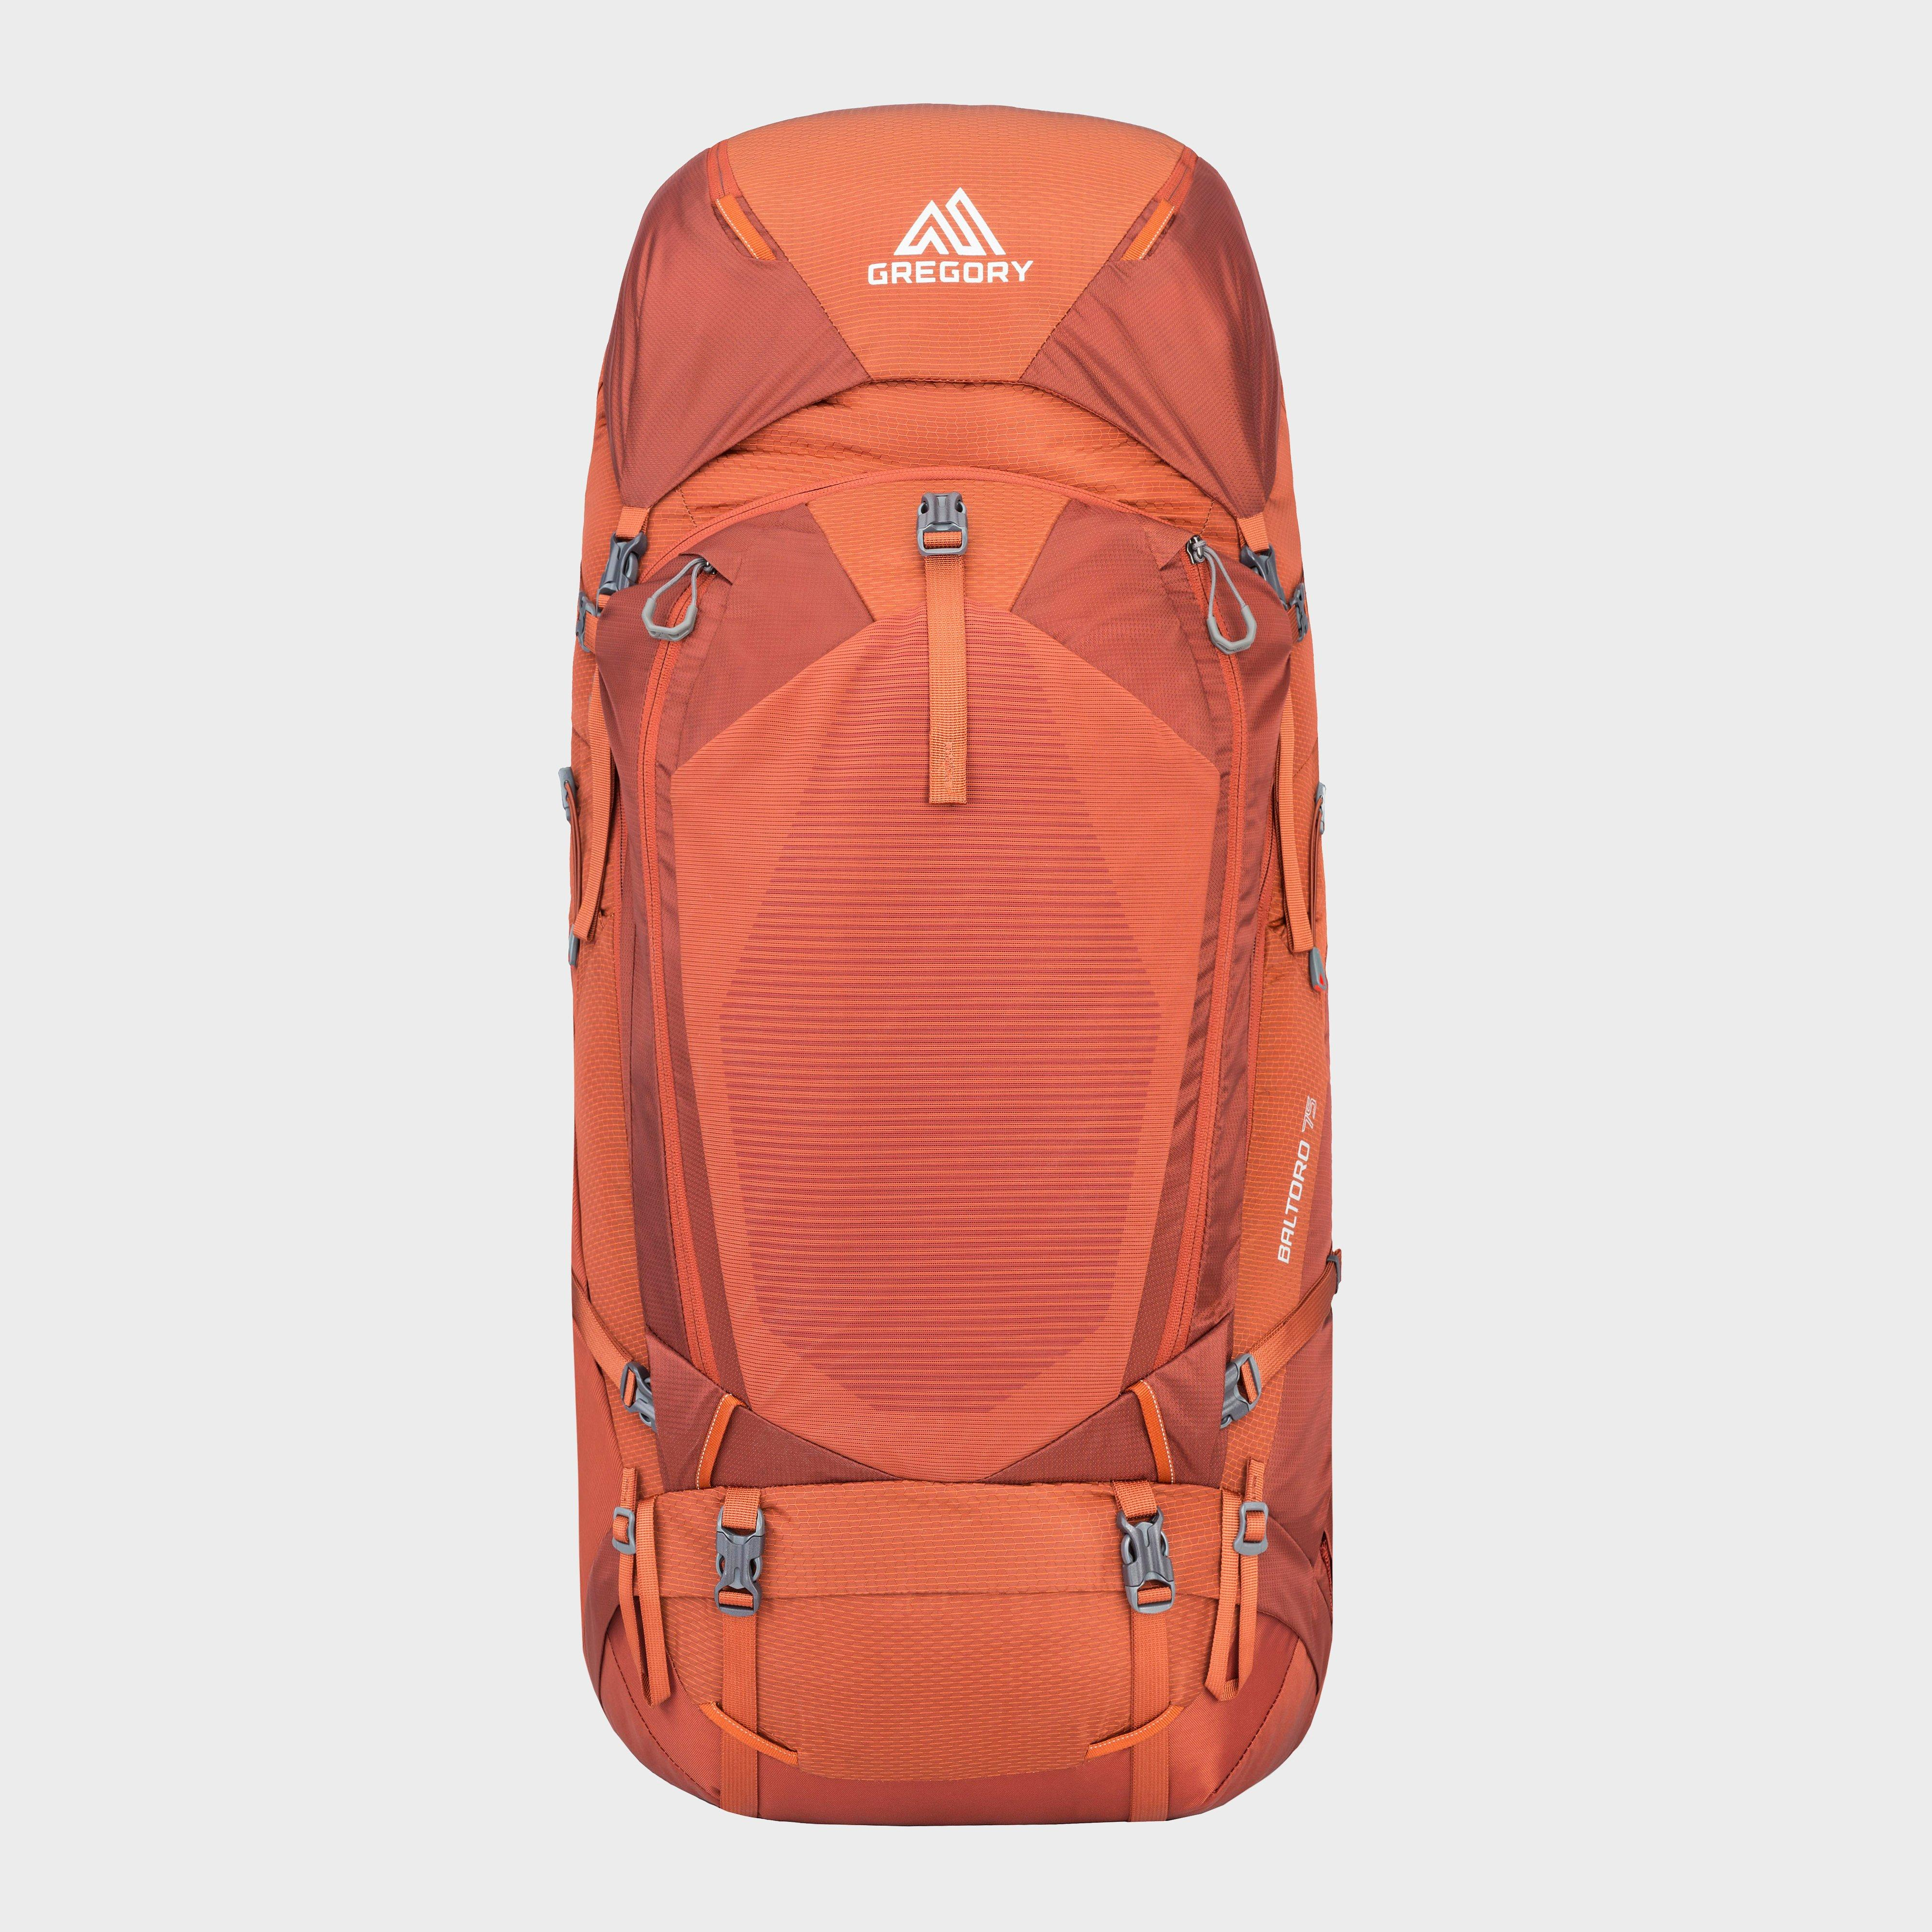 Gregory Baltoro 75 Backpack (large), Orange